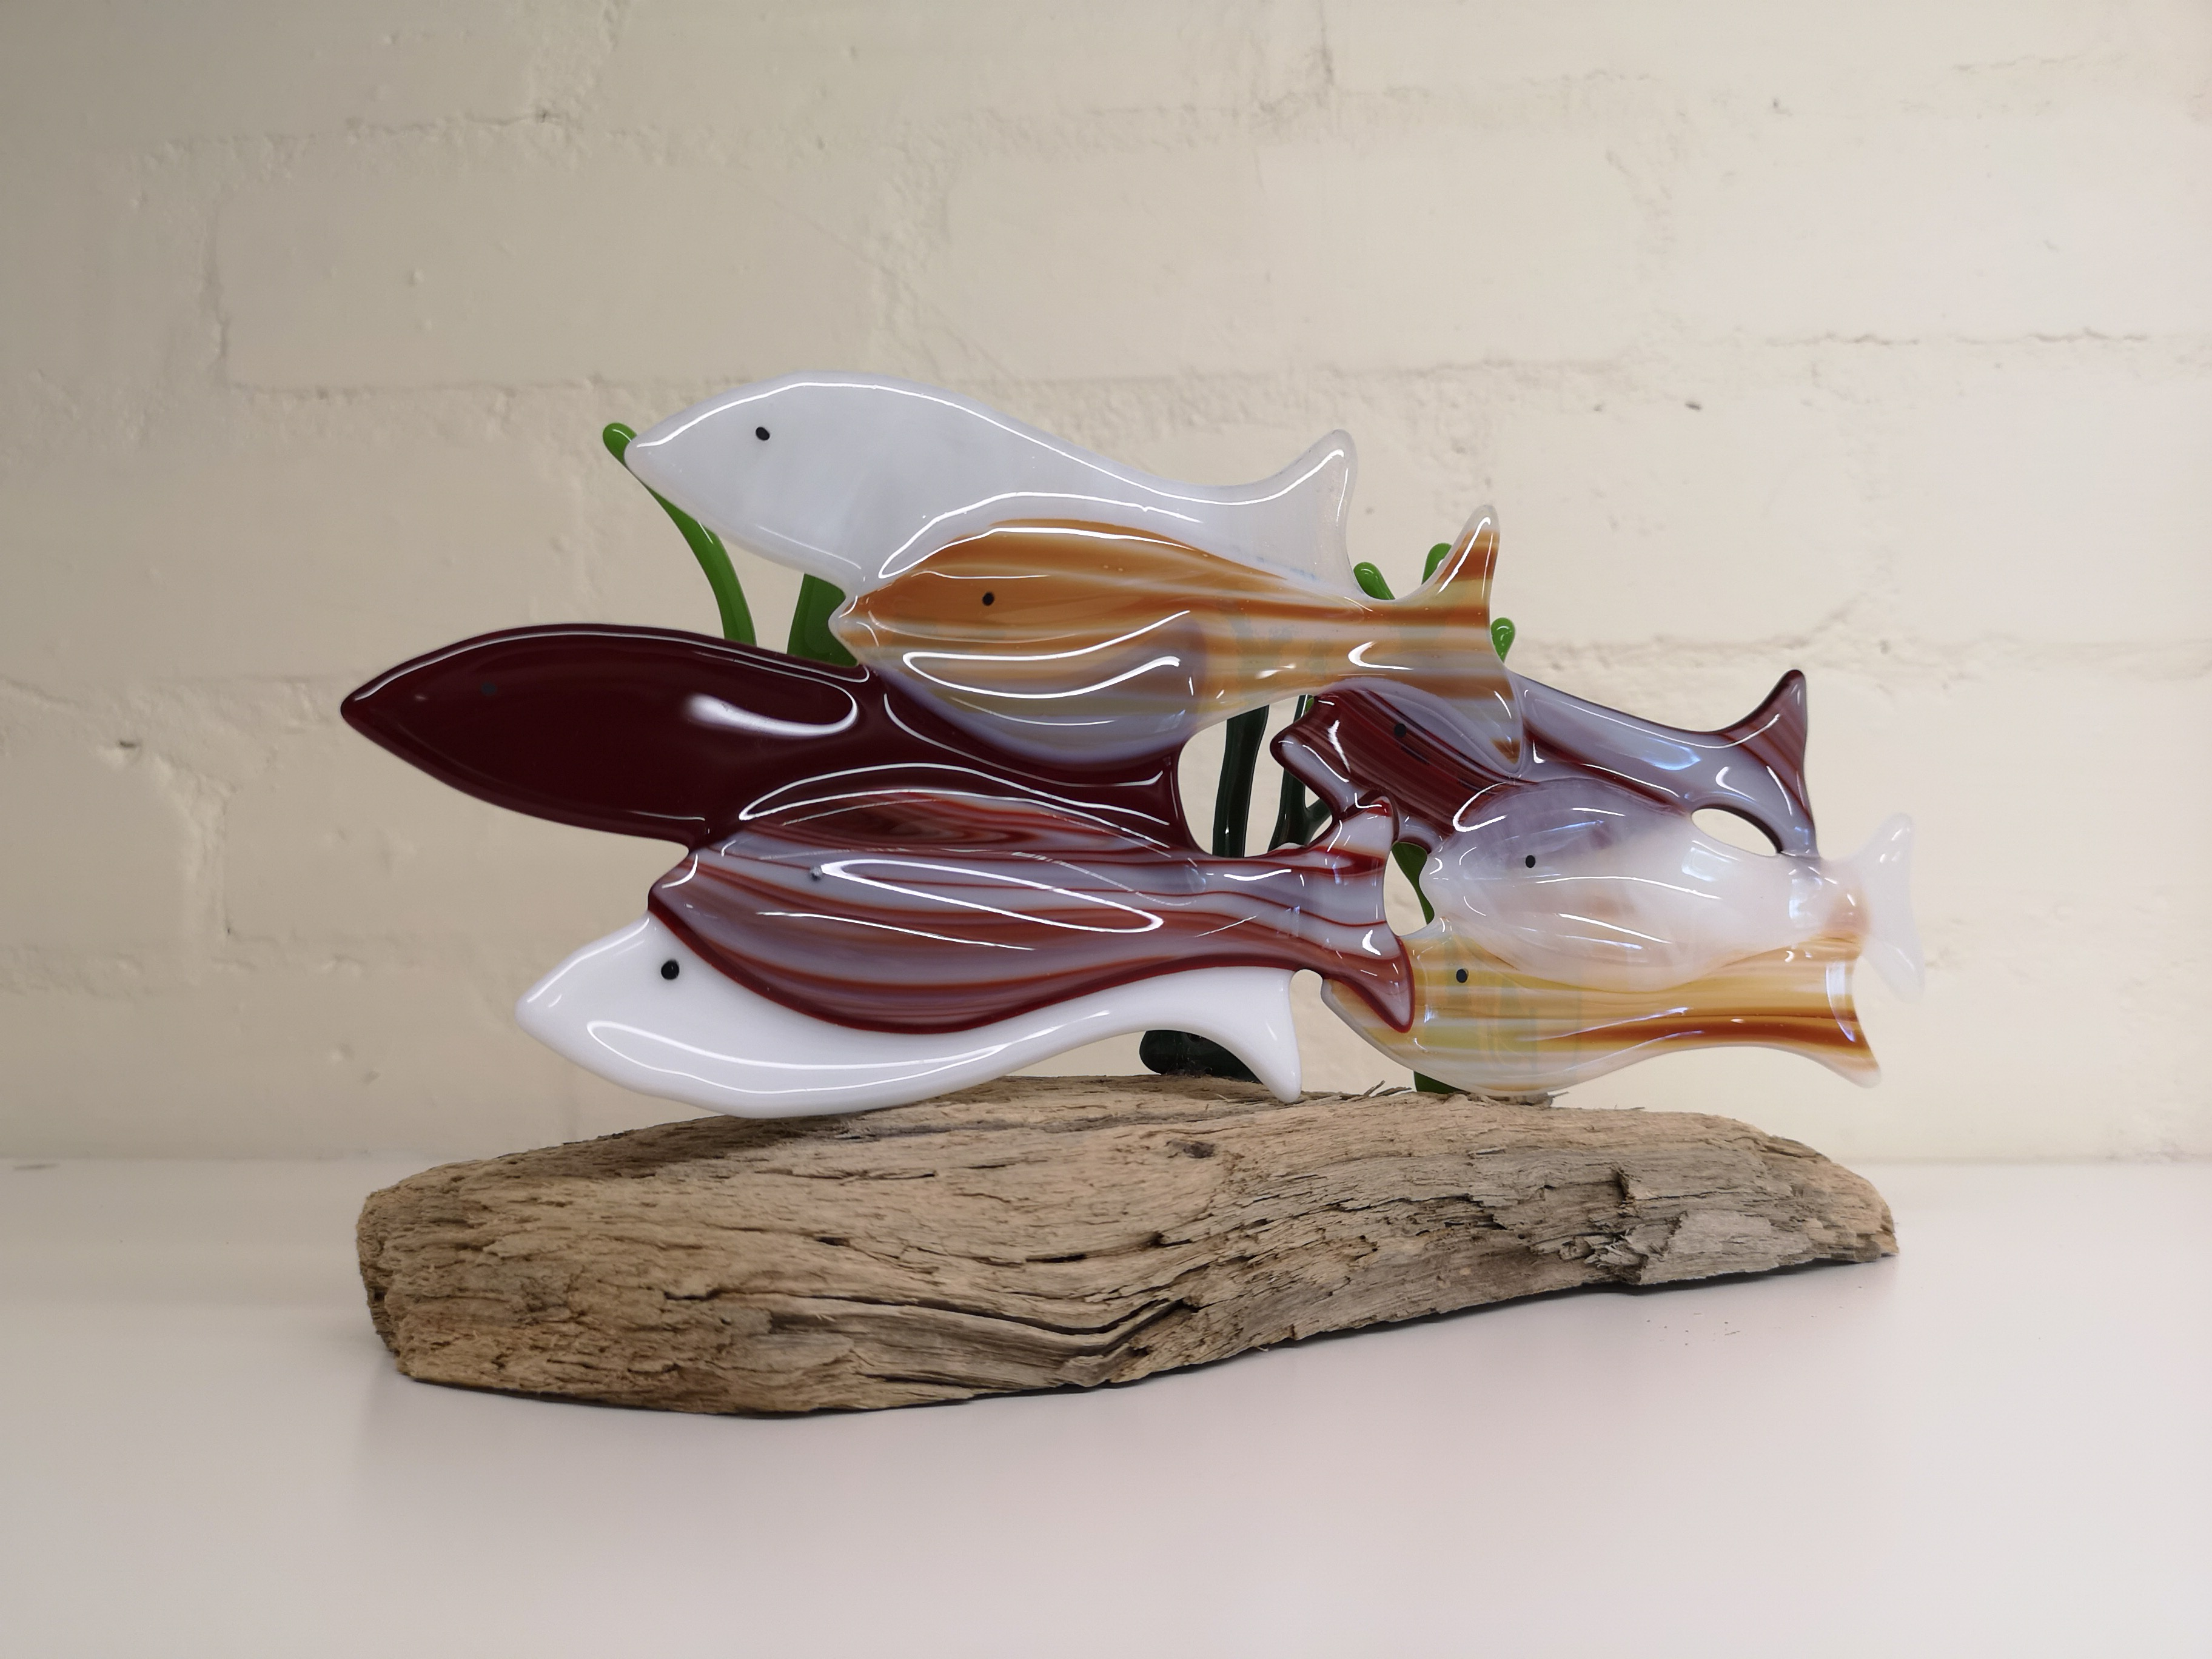 Shoal of fish on driftwood (30cm across)